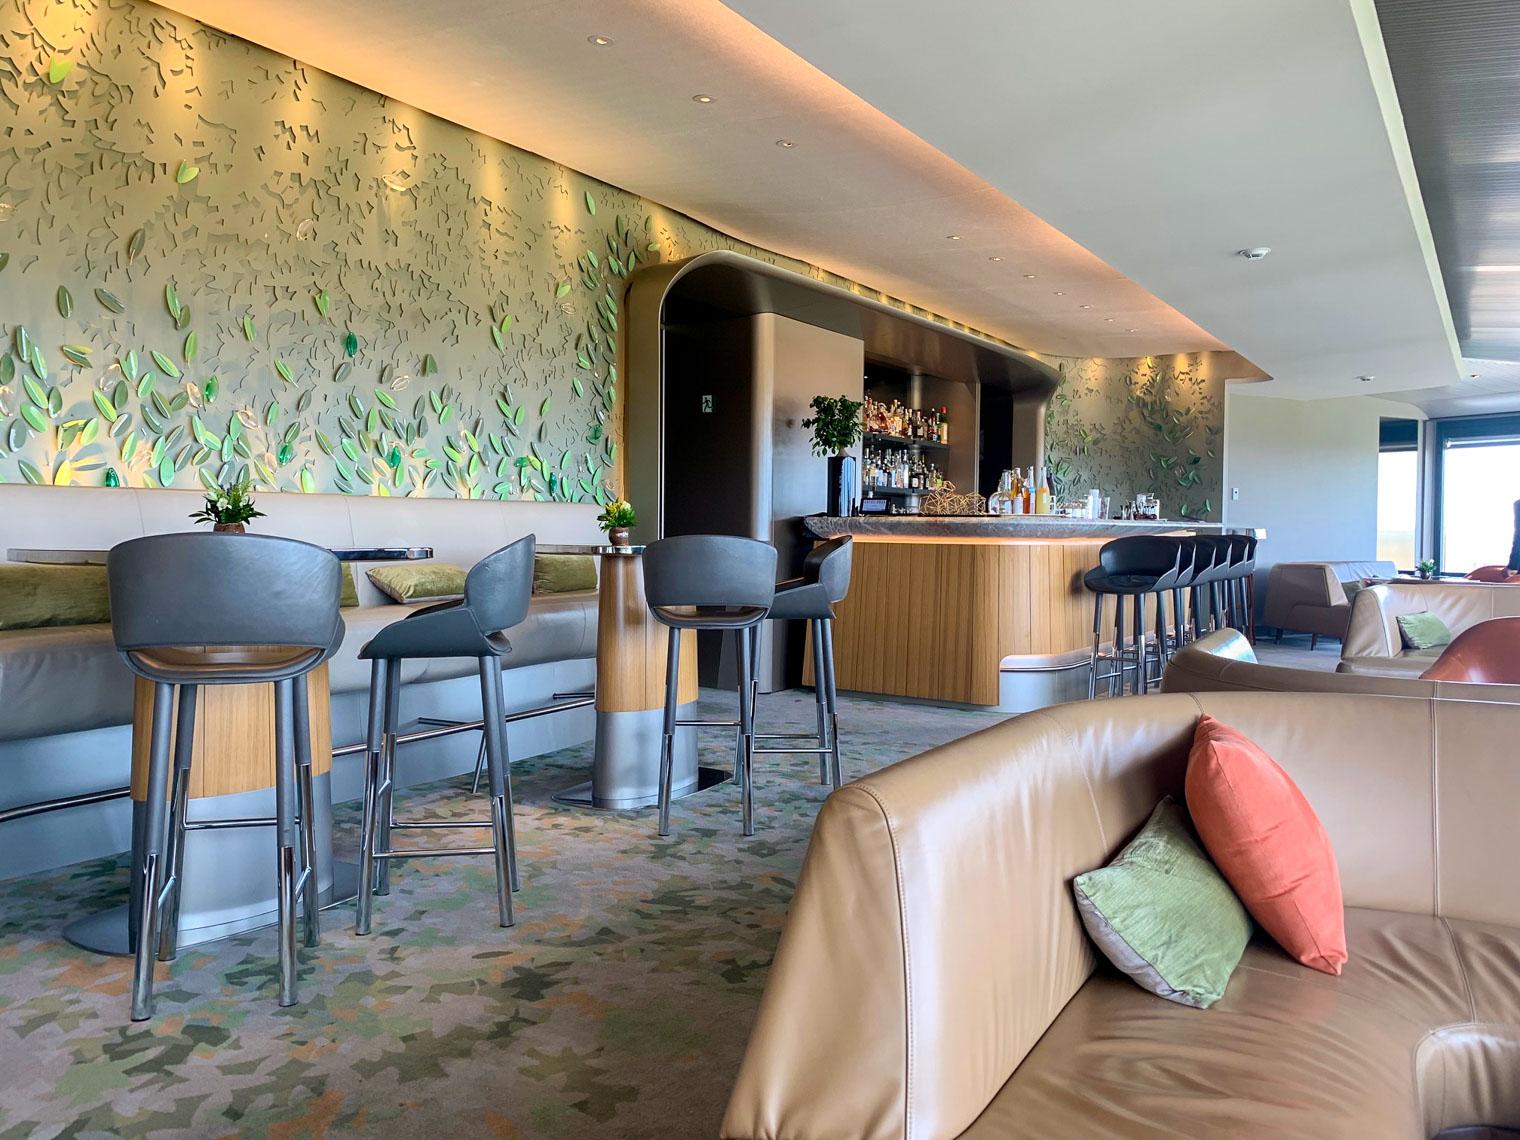 Contemporary Il Giardino bar at Hotel Eden Rome Italy